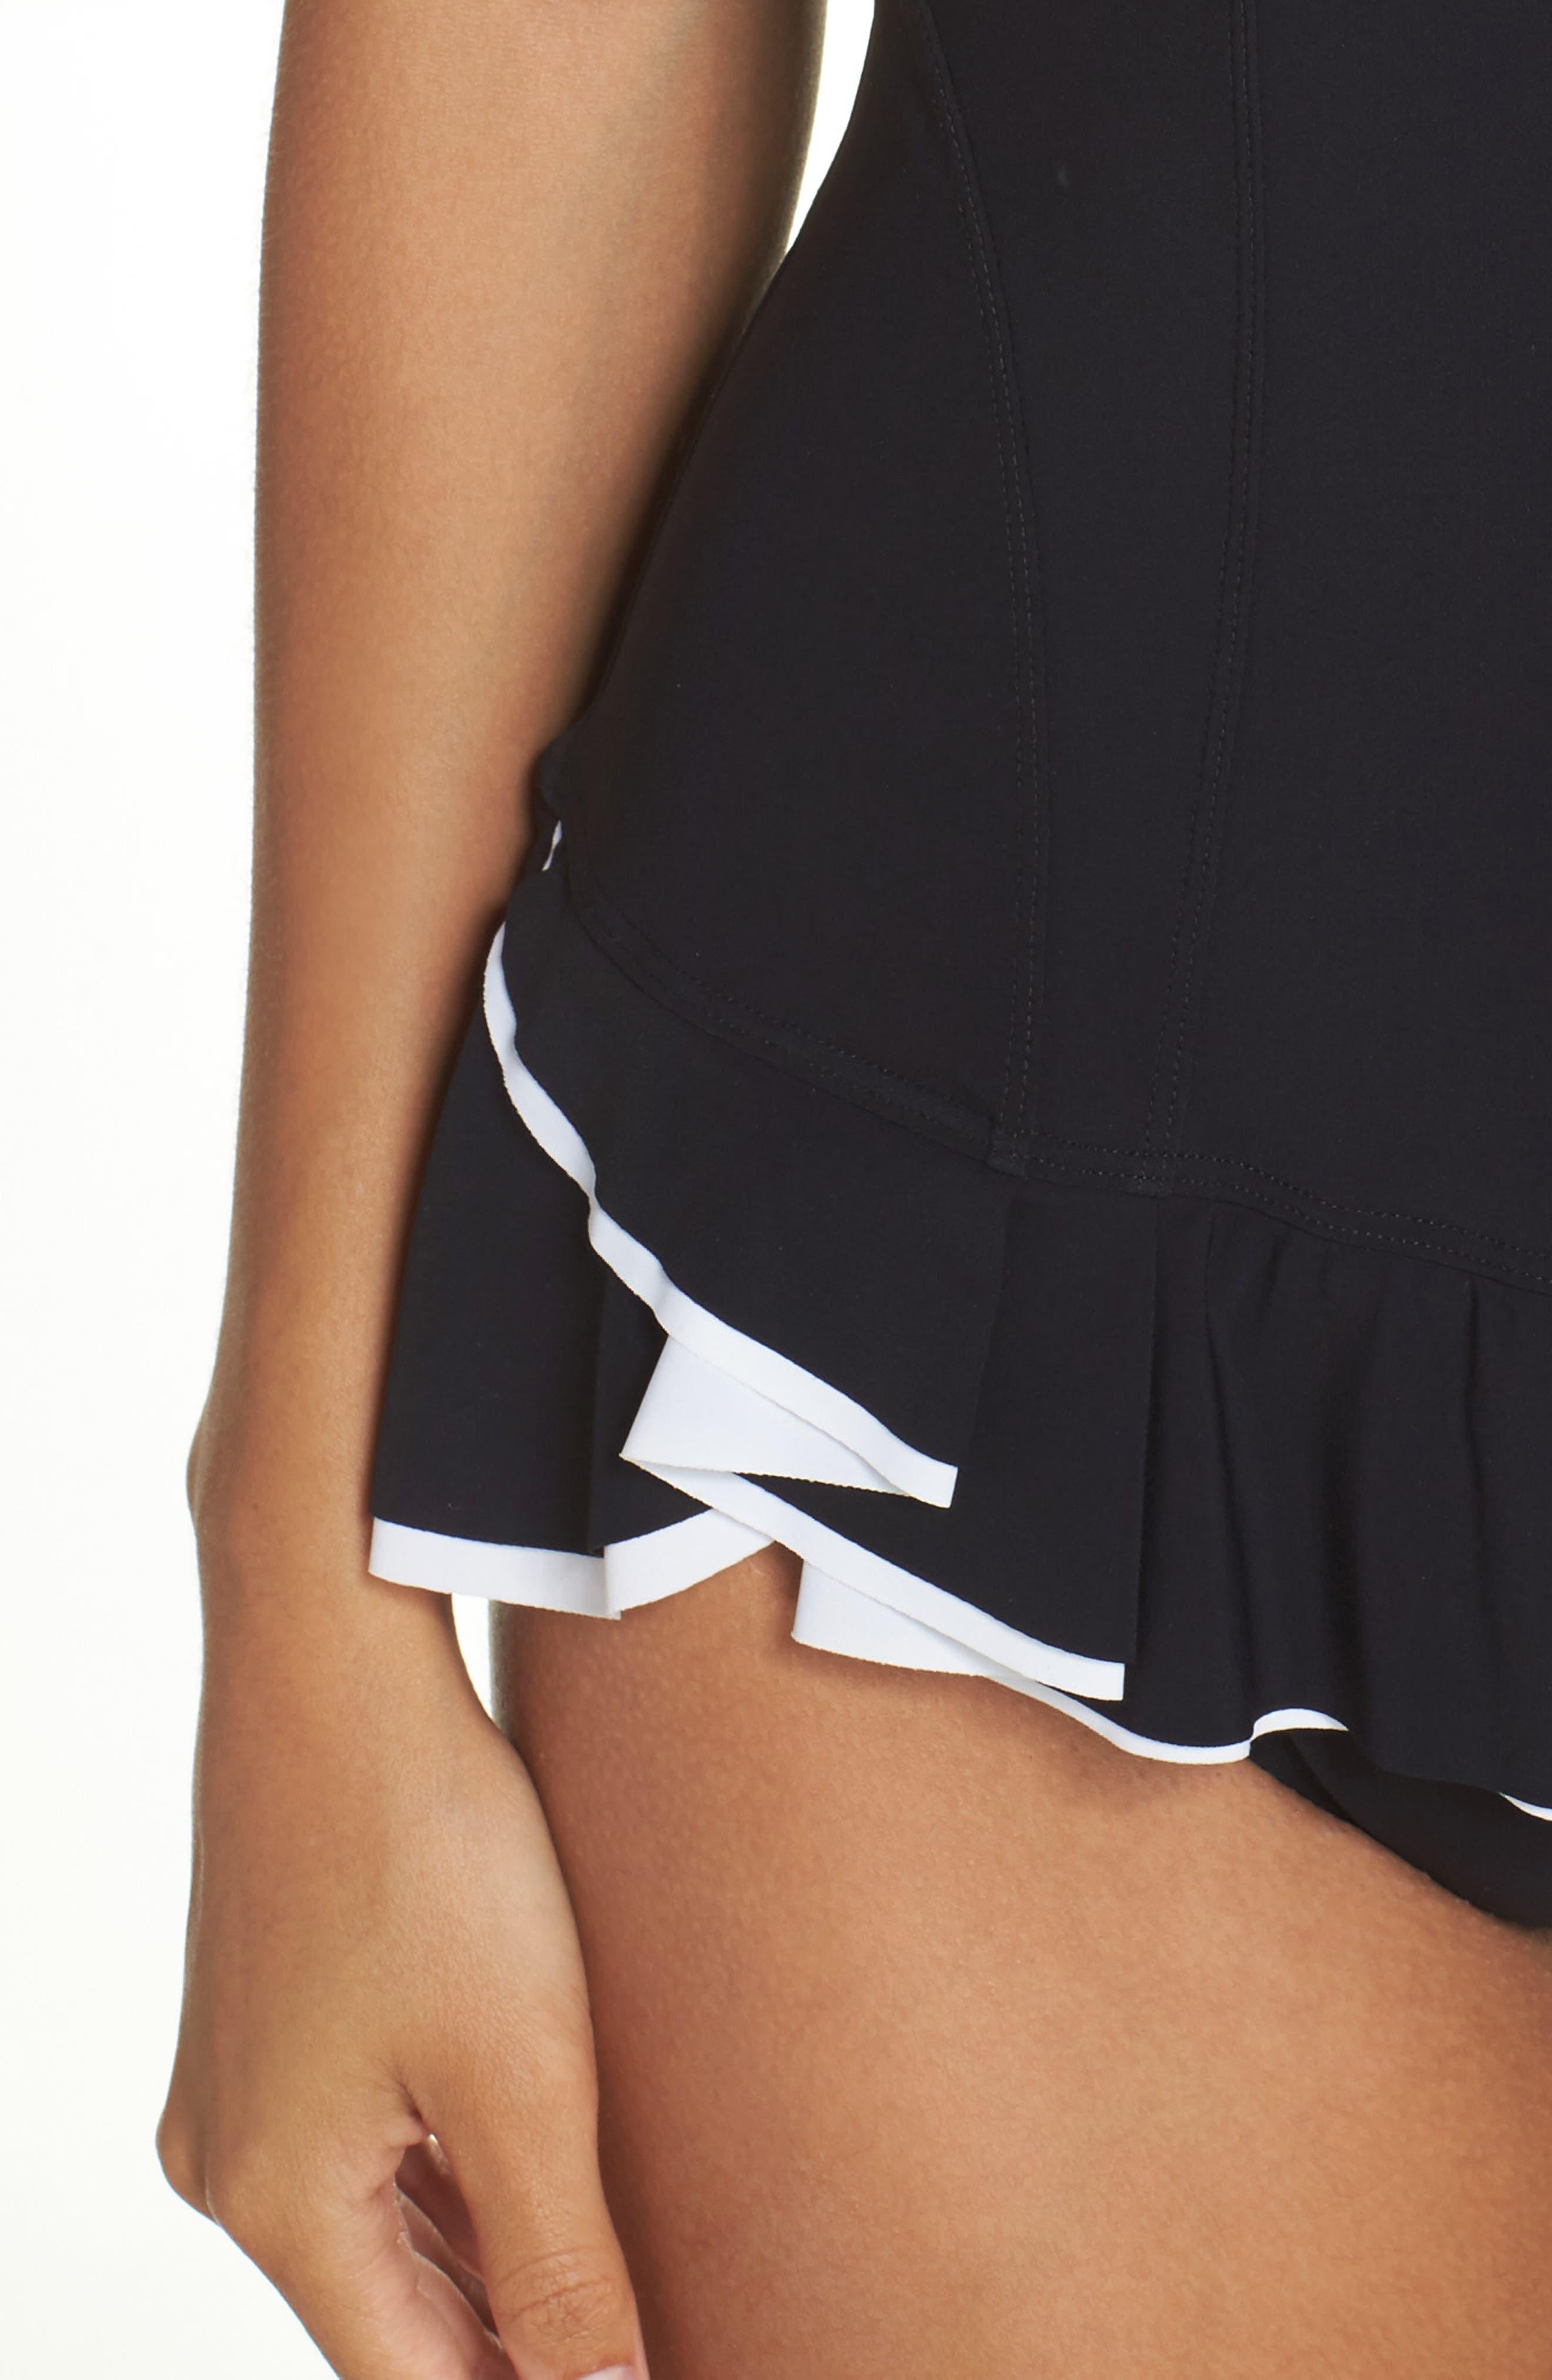 Belle Curve Peplum One-Piece Swimsuit,                             Alternate thumbnail 4, color,                             Black/ White